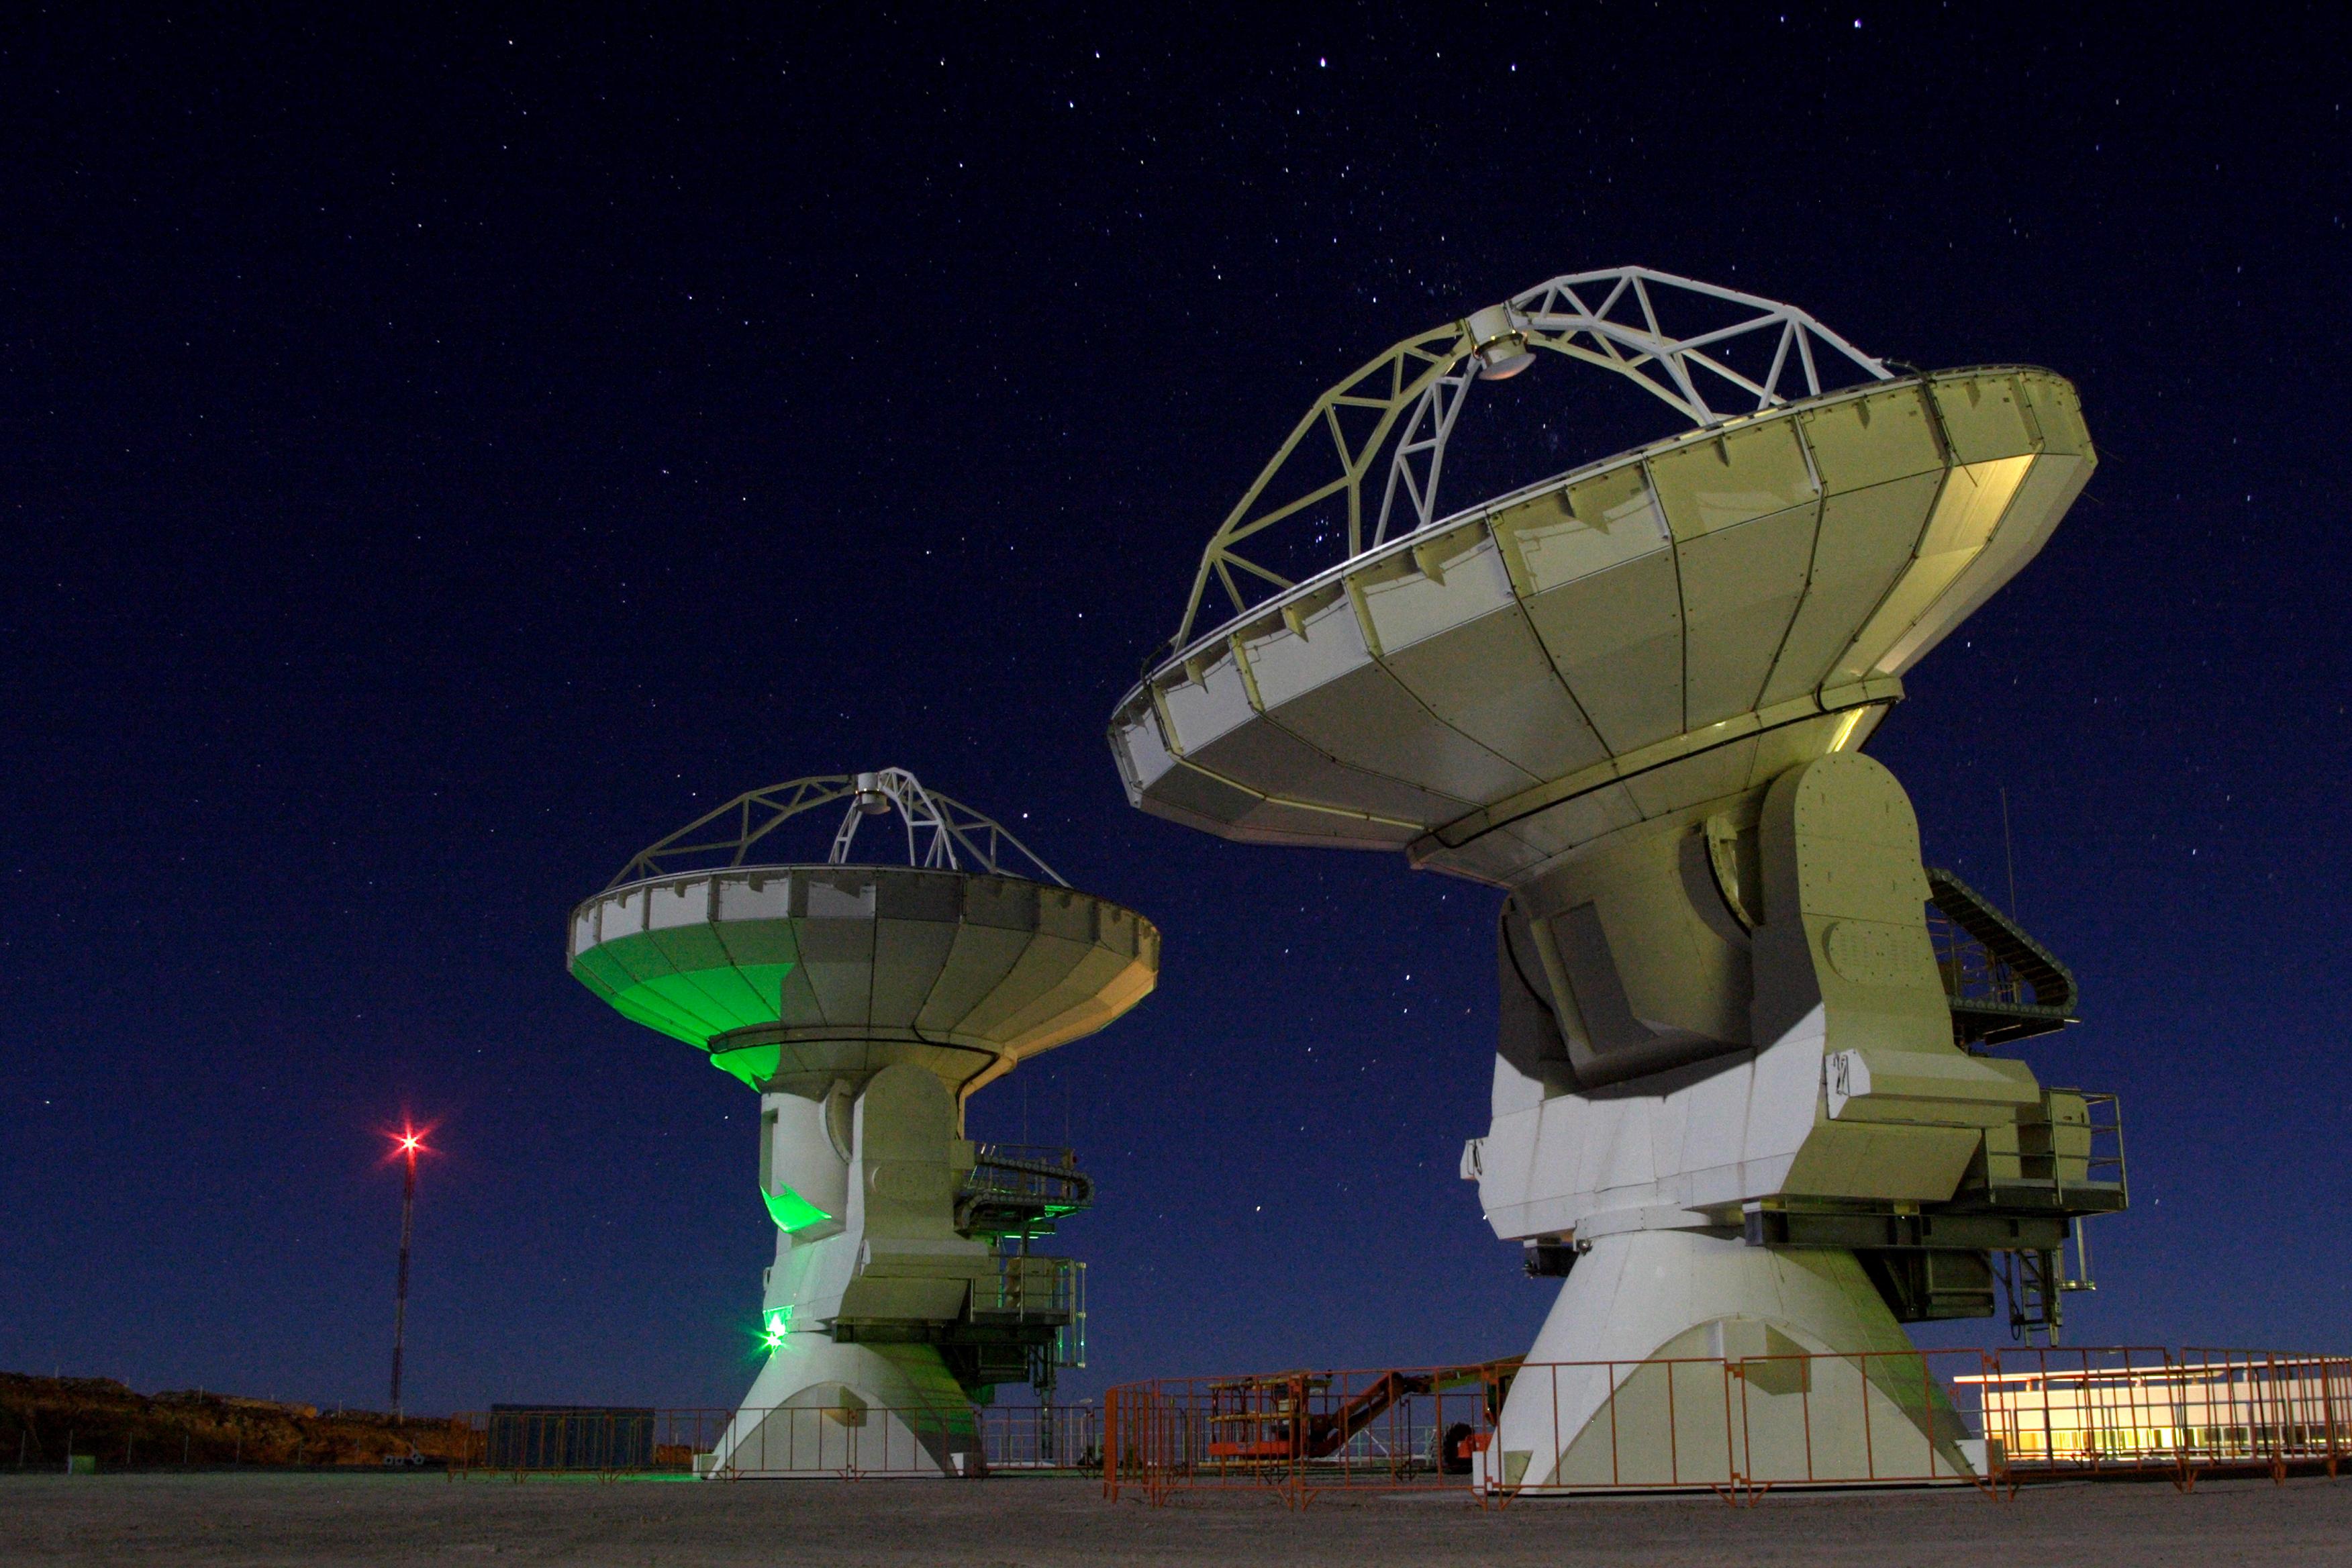 ALMA antennas at night